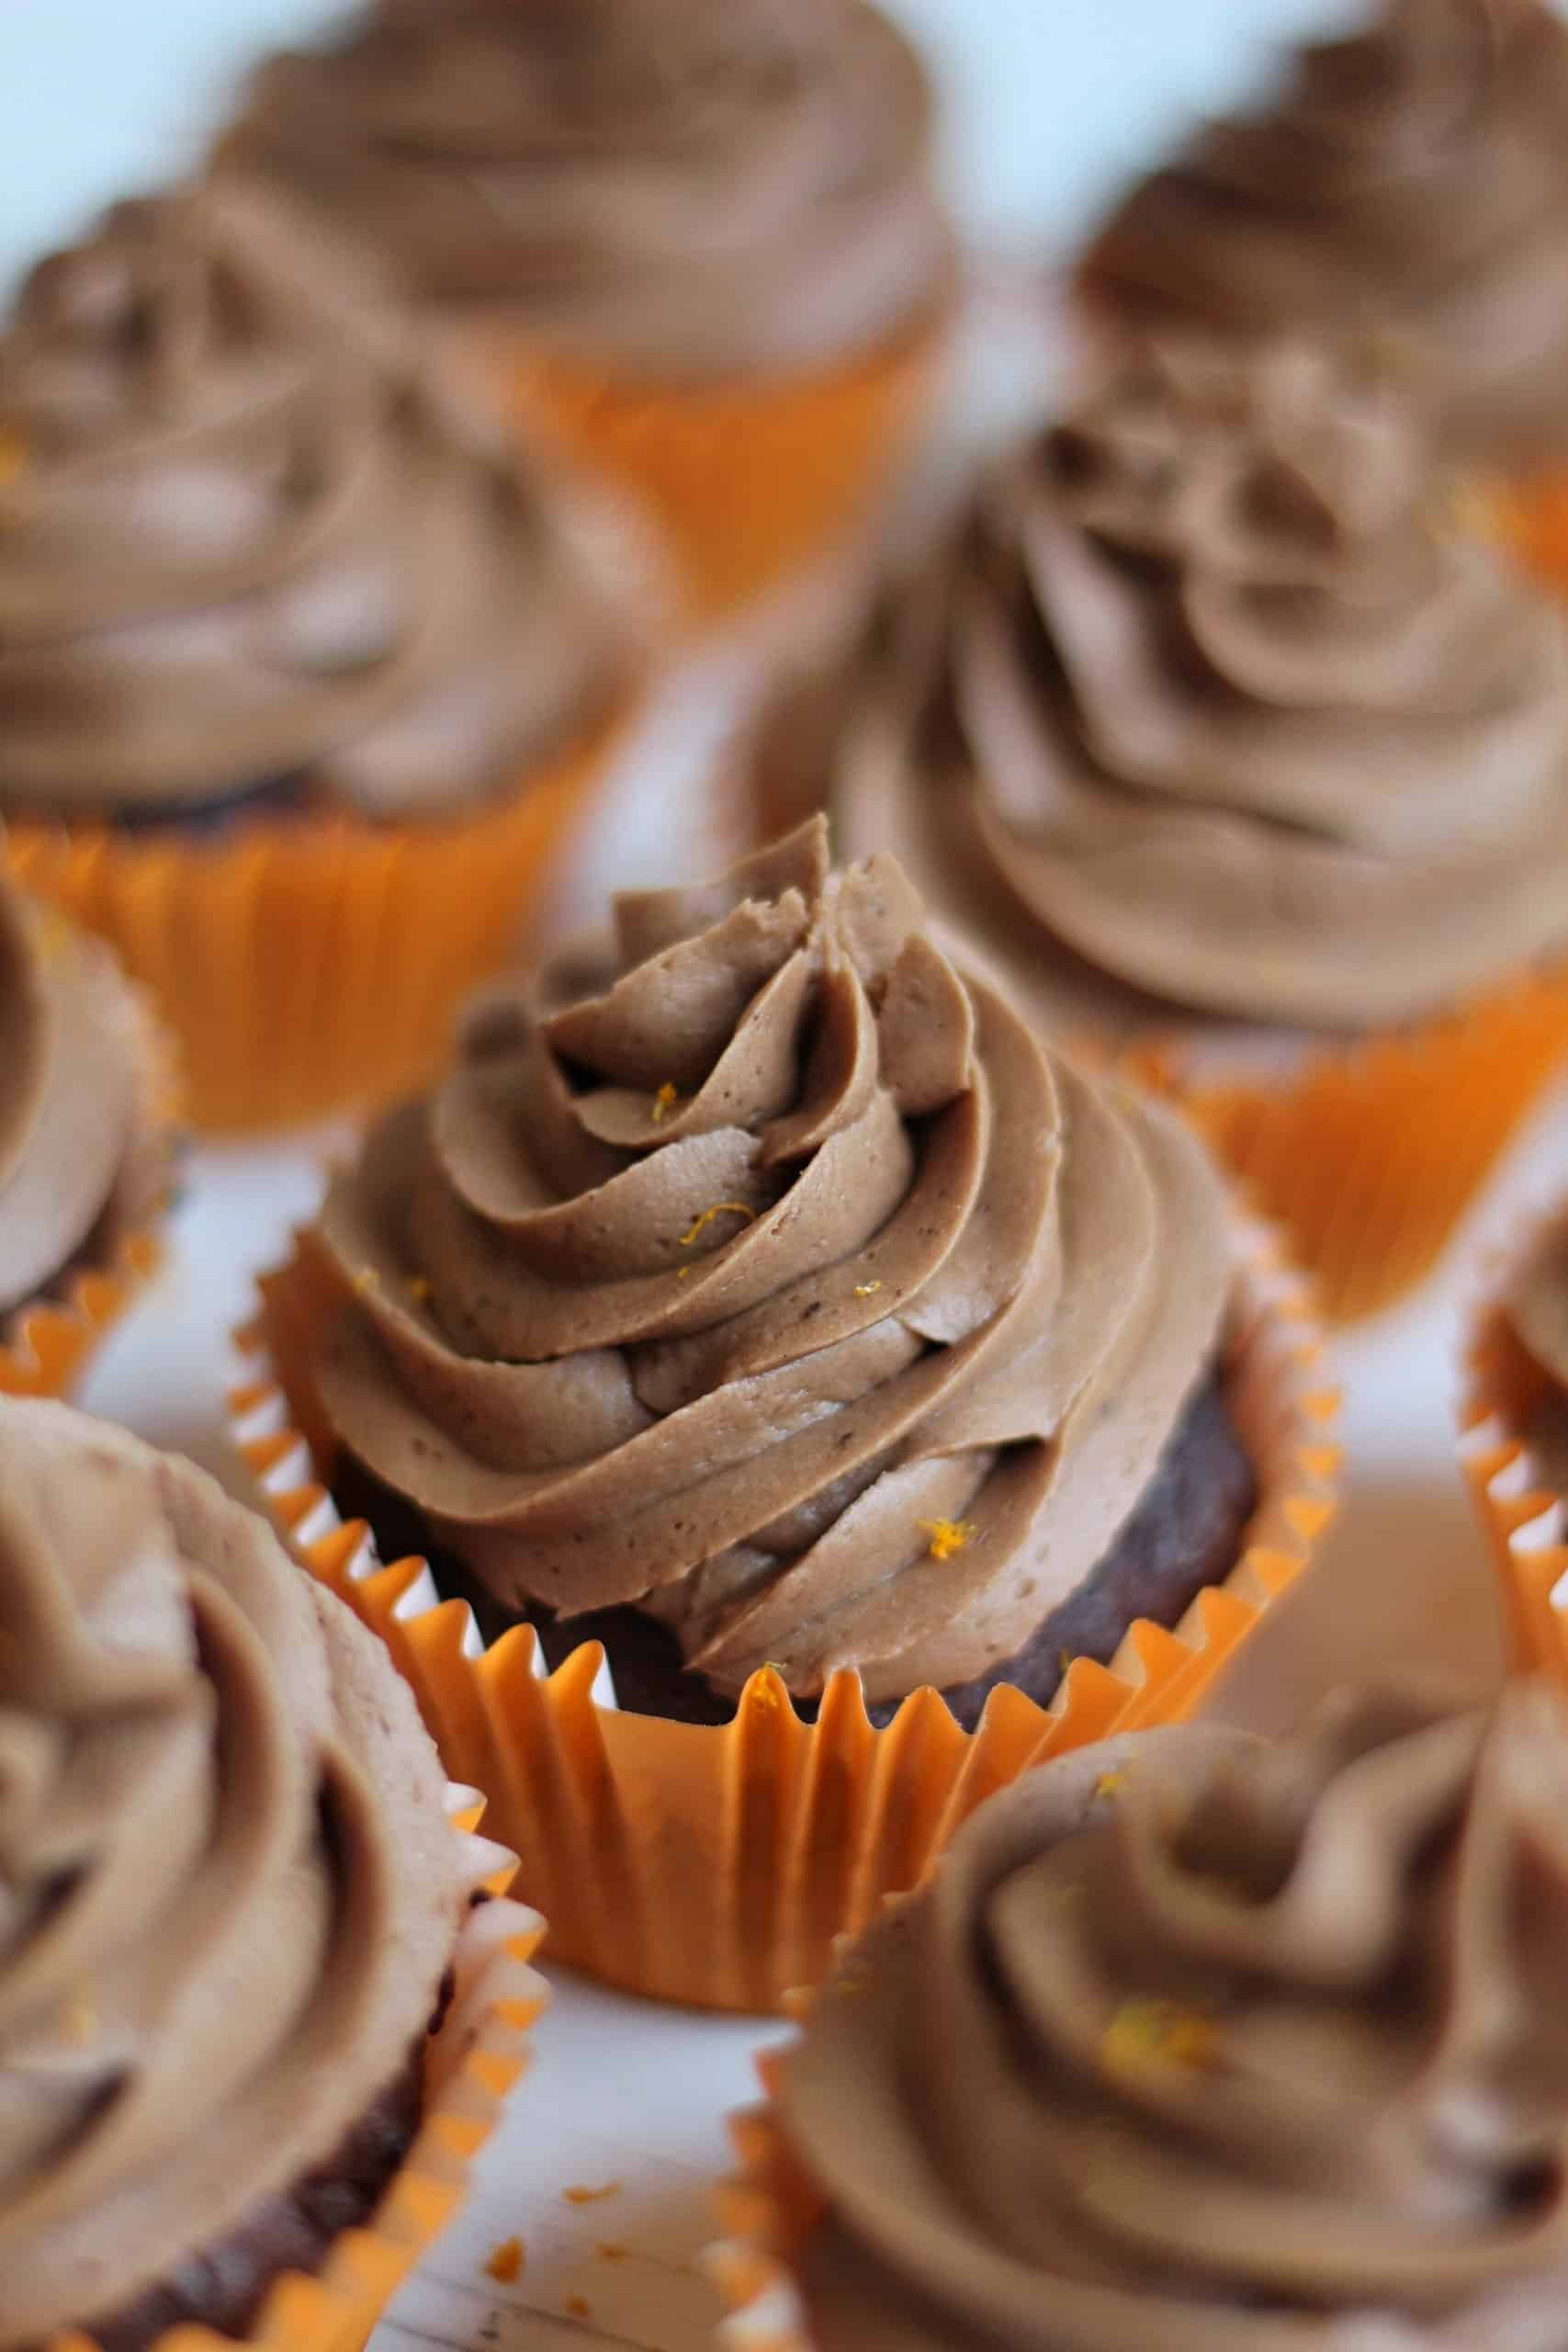 Gluten Free Chocolate Orange Cupcakes Recipe 31_Fotor